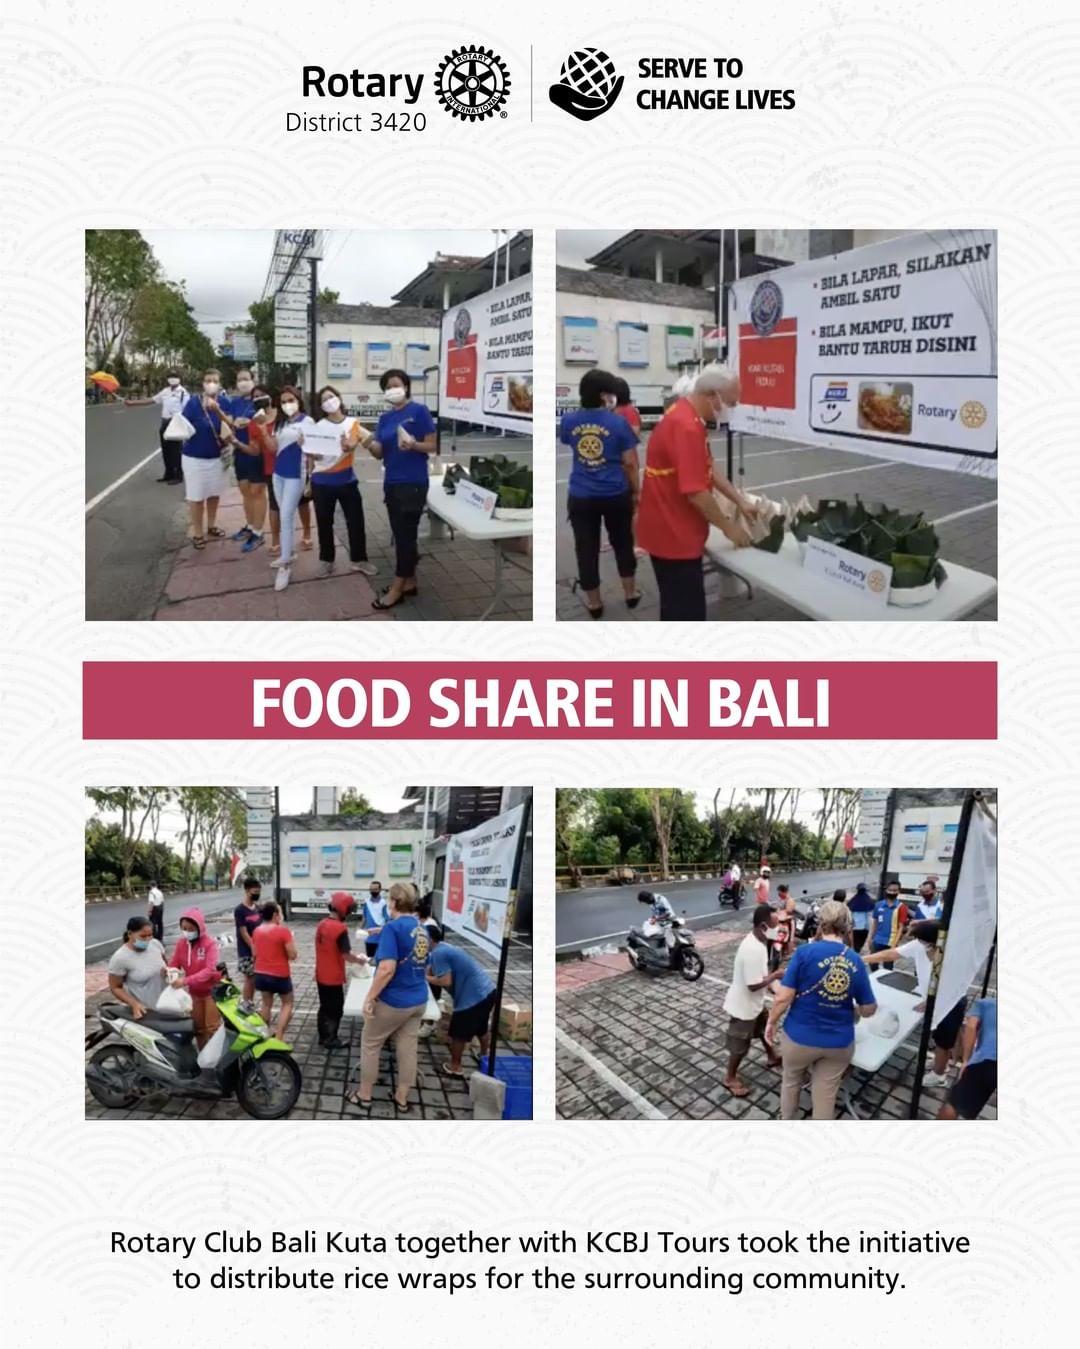 Food Share in Bali